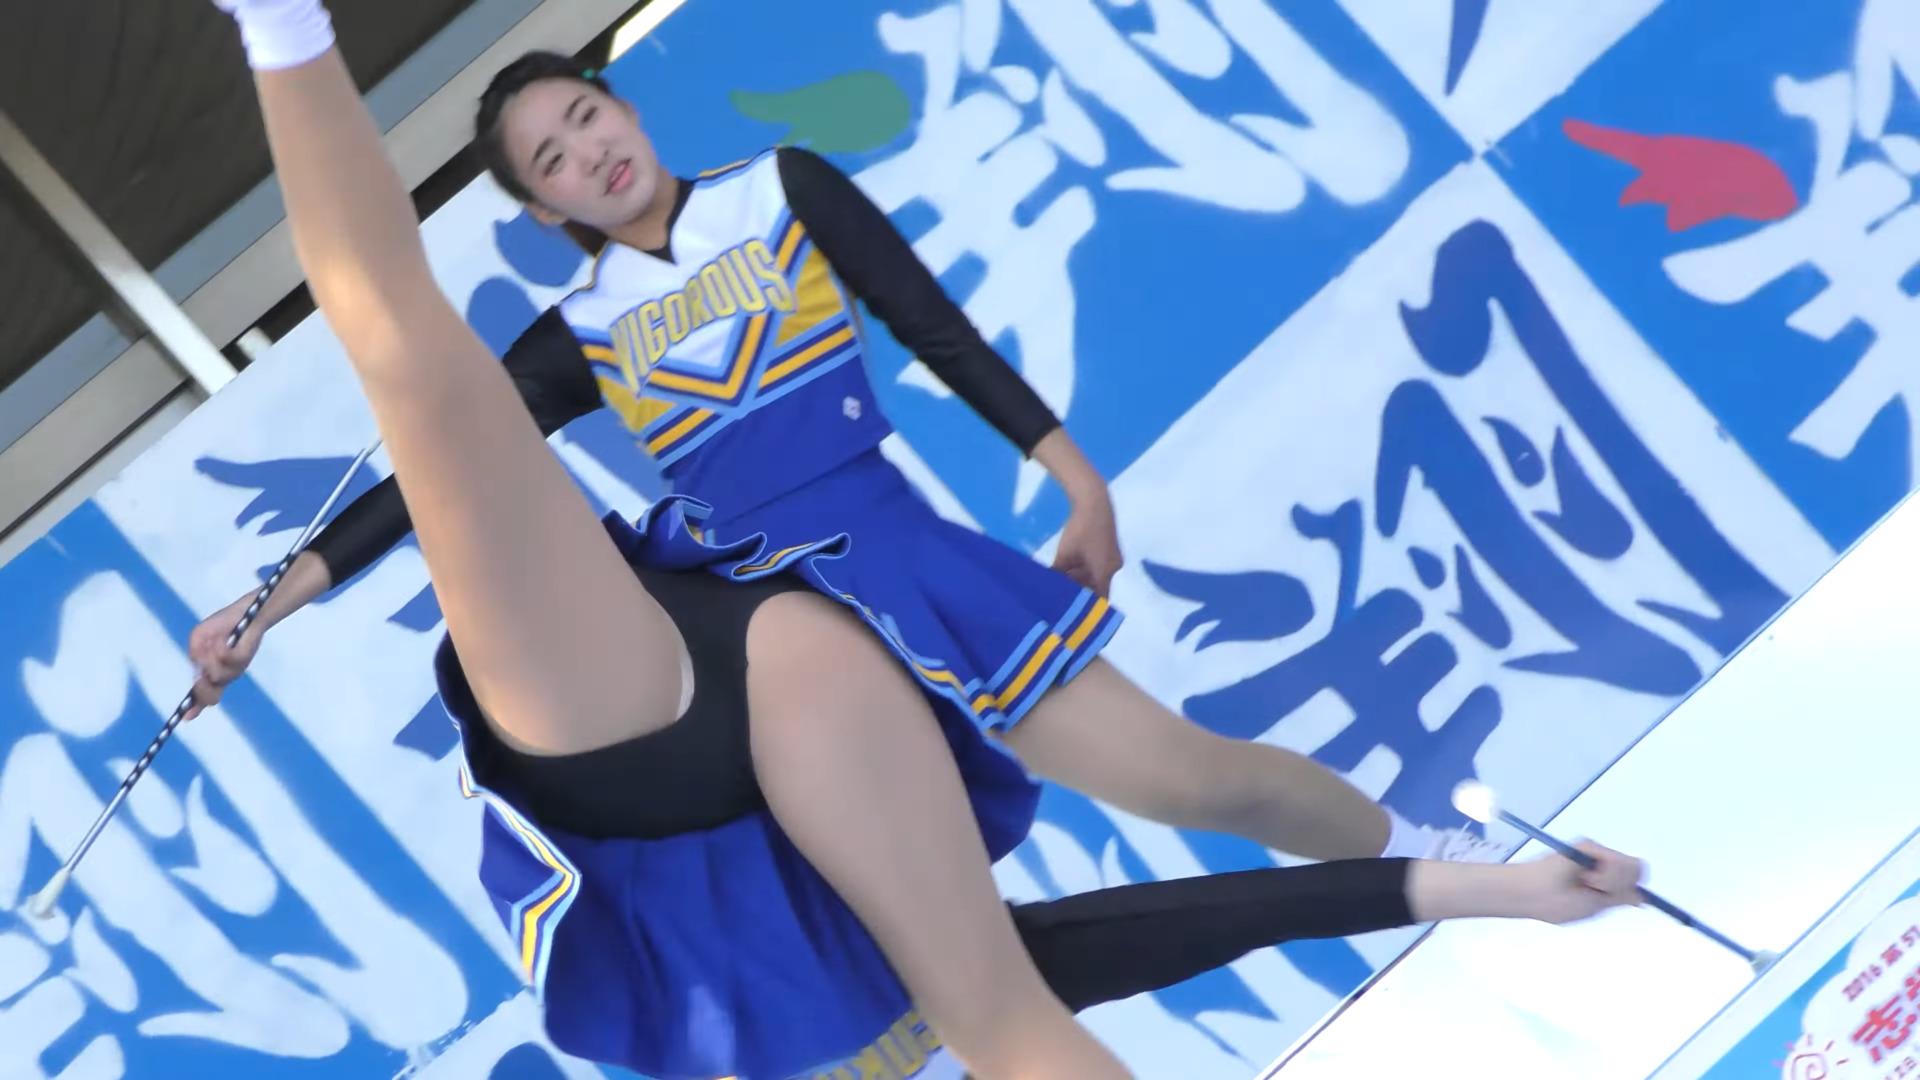 Female university student baton twirling club④ 00:27